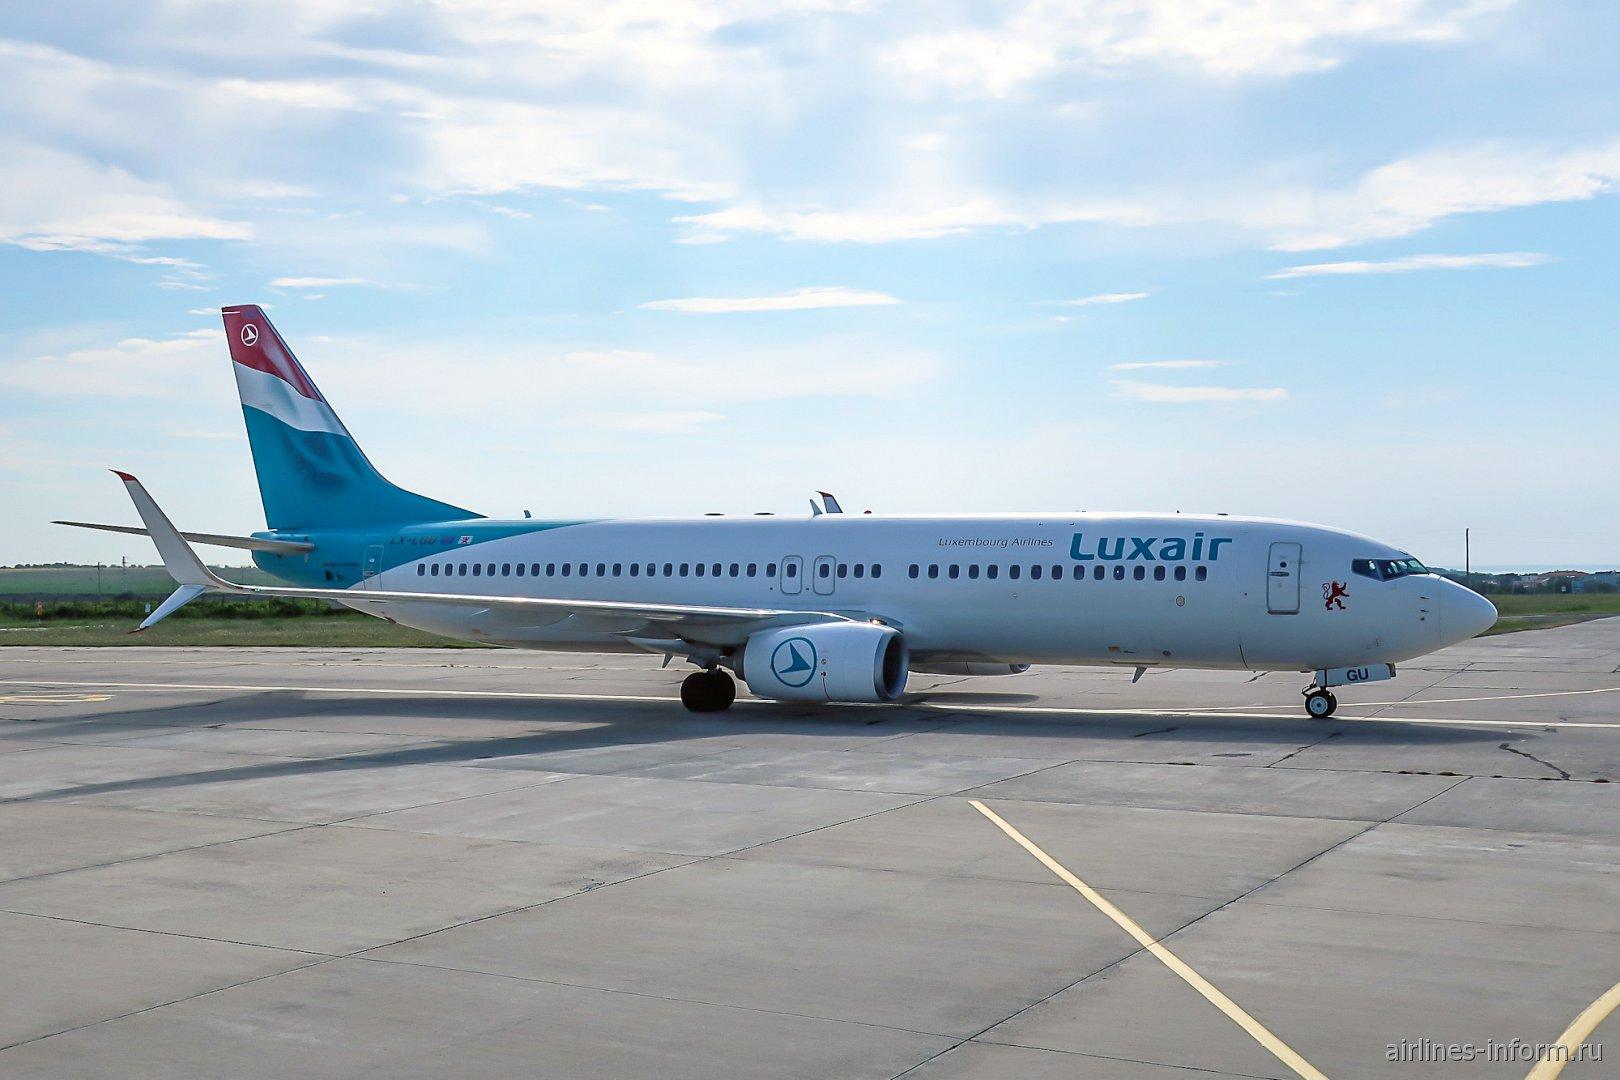 Самолет Боинг-737-800 авиакомпании Luxair из Люксембурга